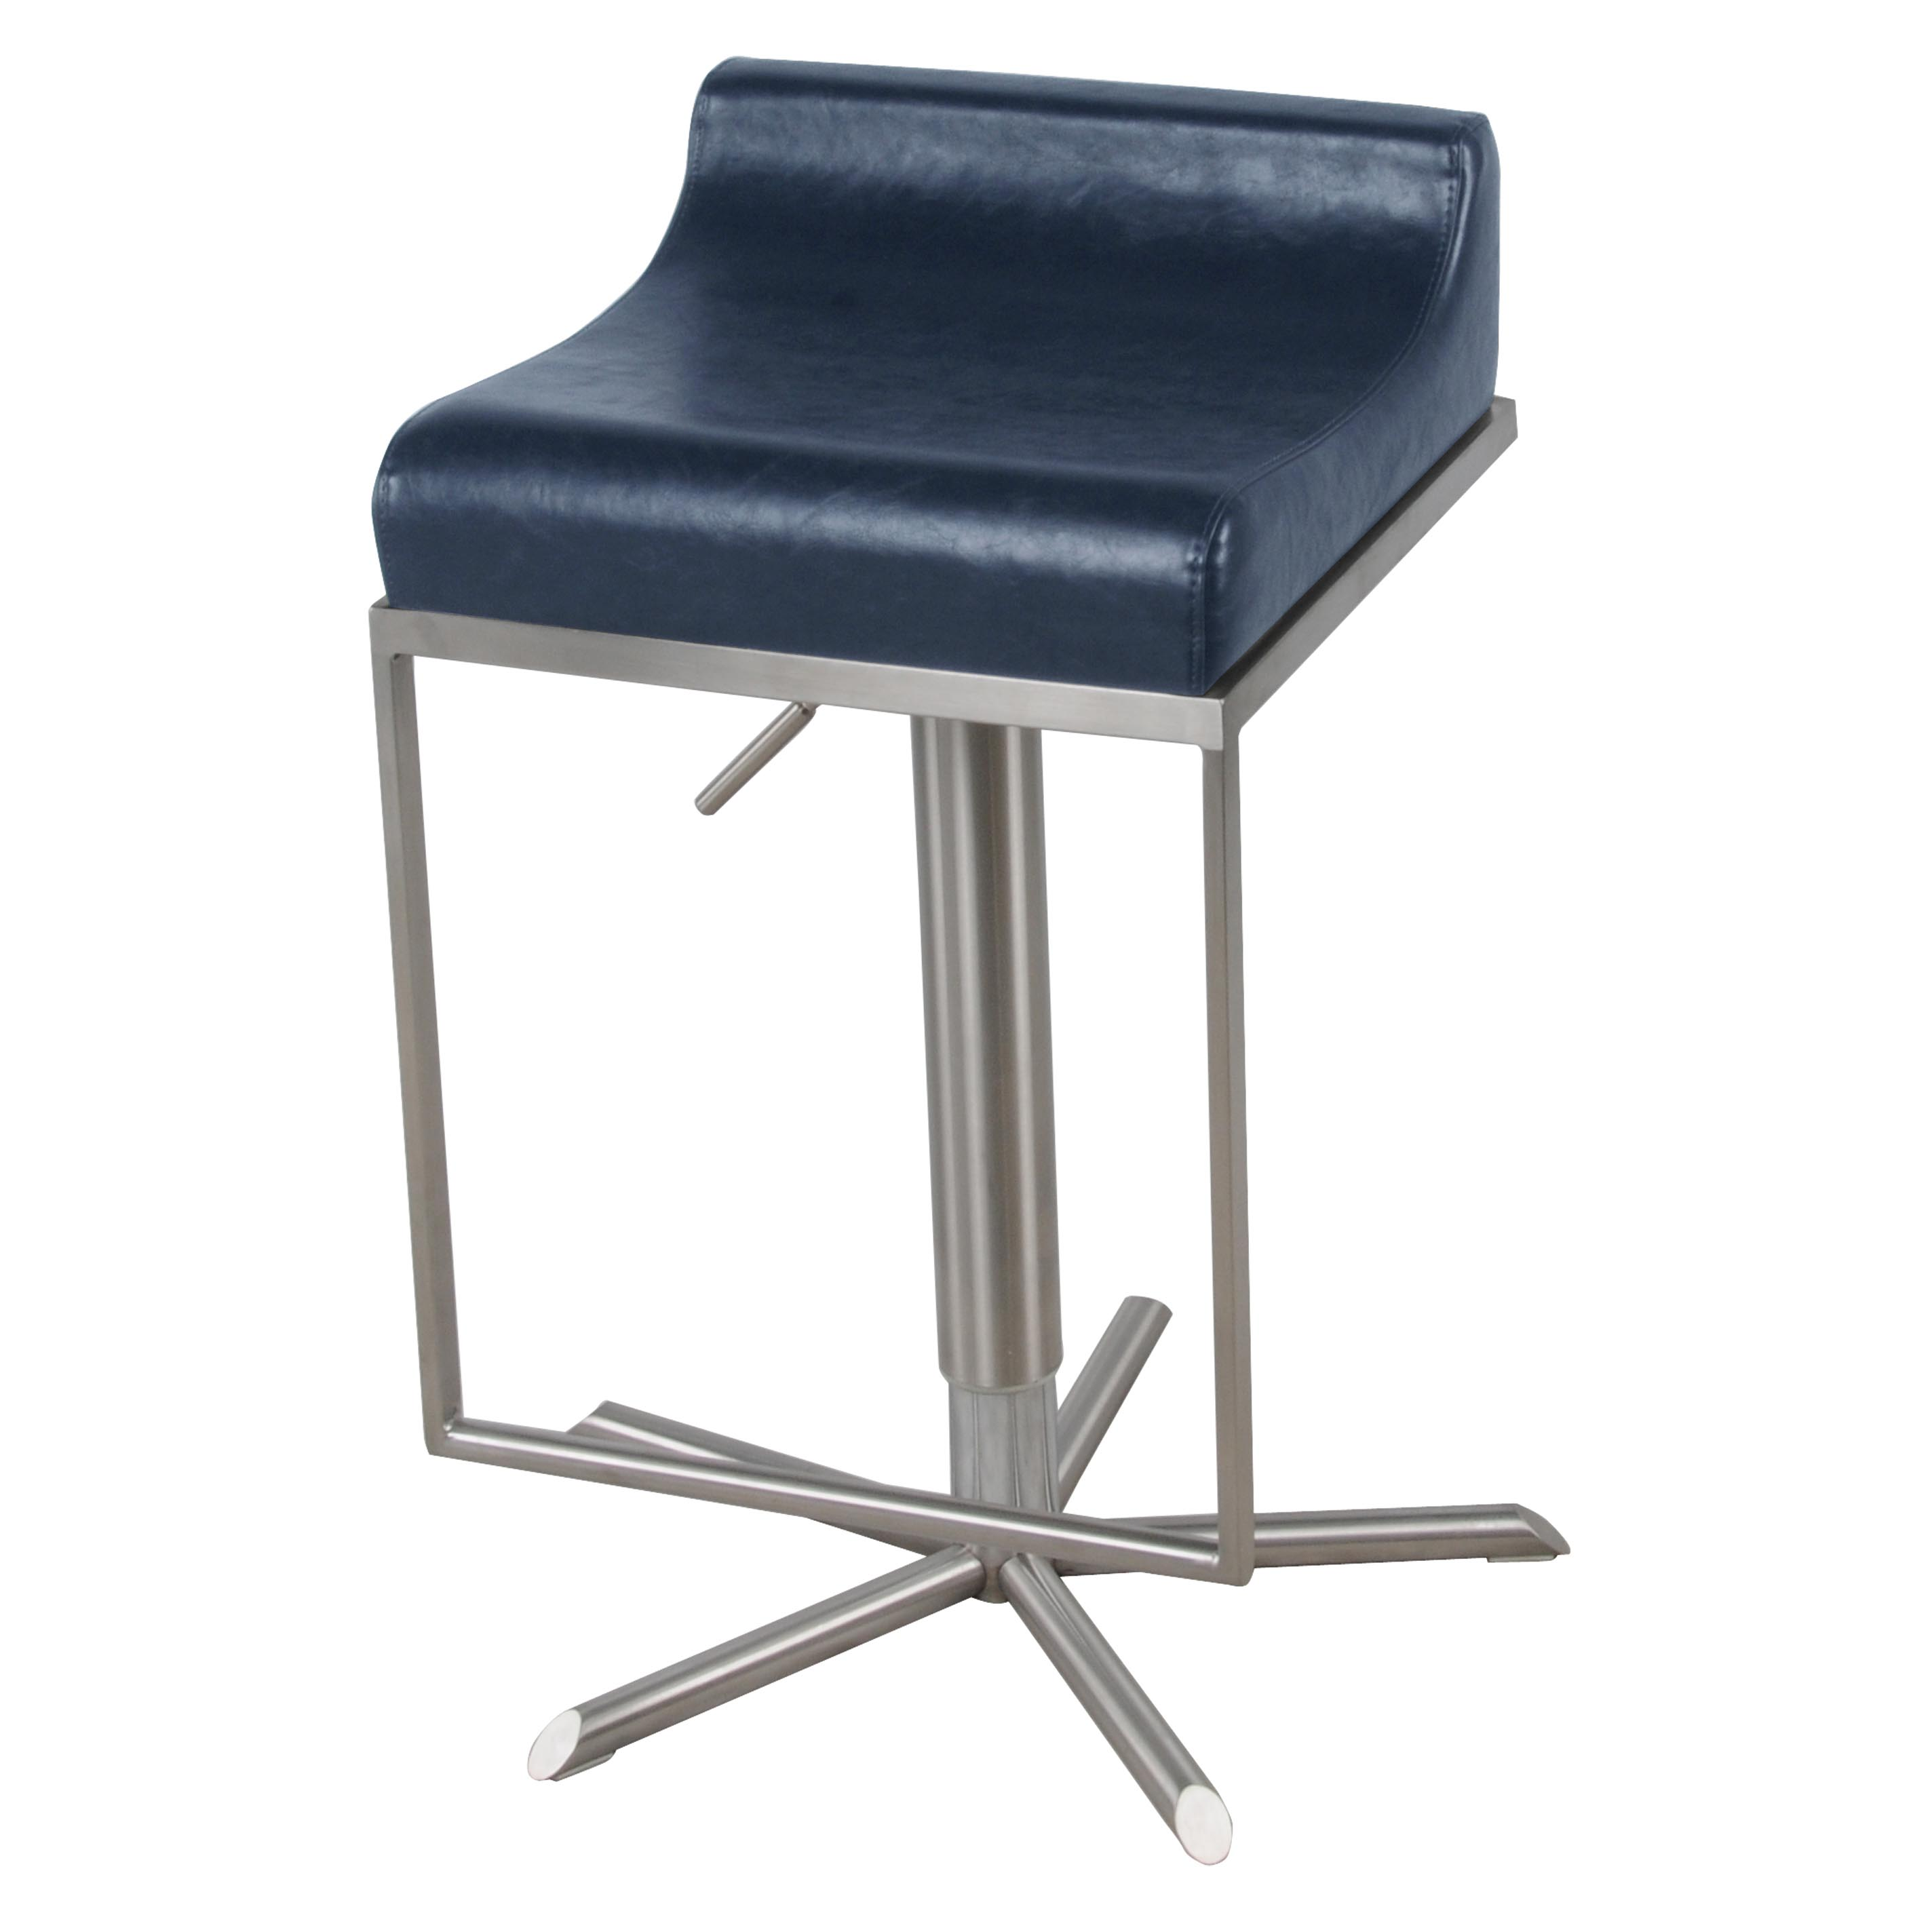 zac swivel chair black covers with purple sash pu premium gaslift bar stool vintage blue boulevard